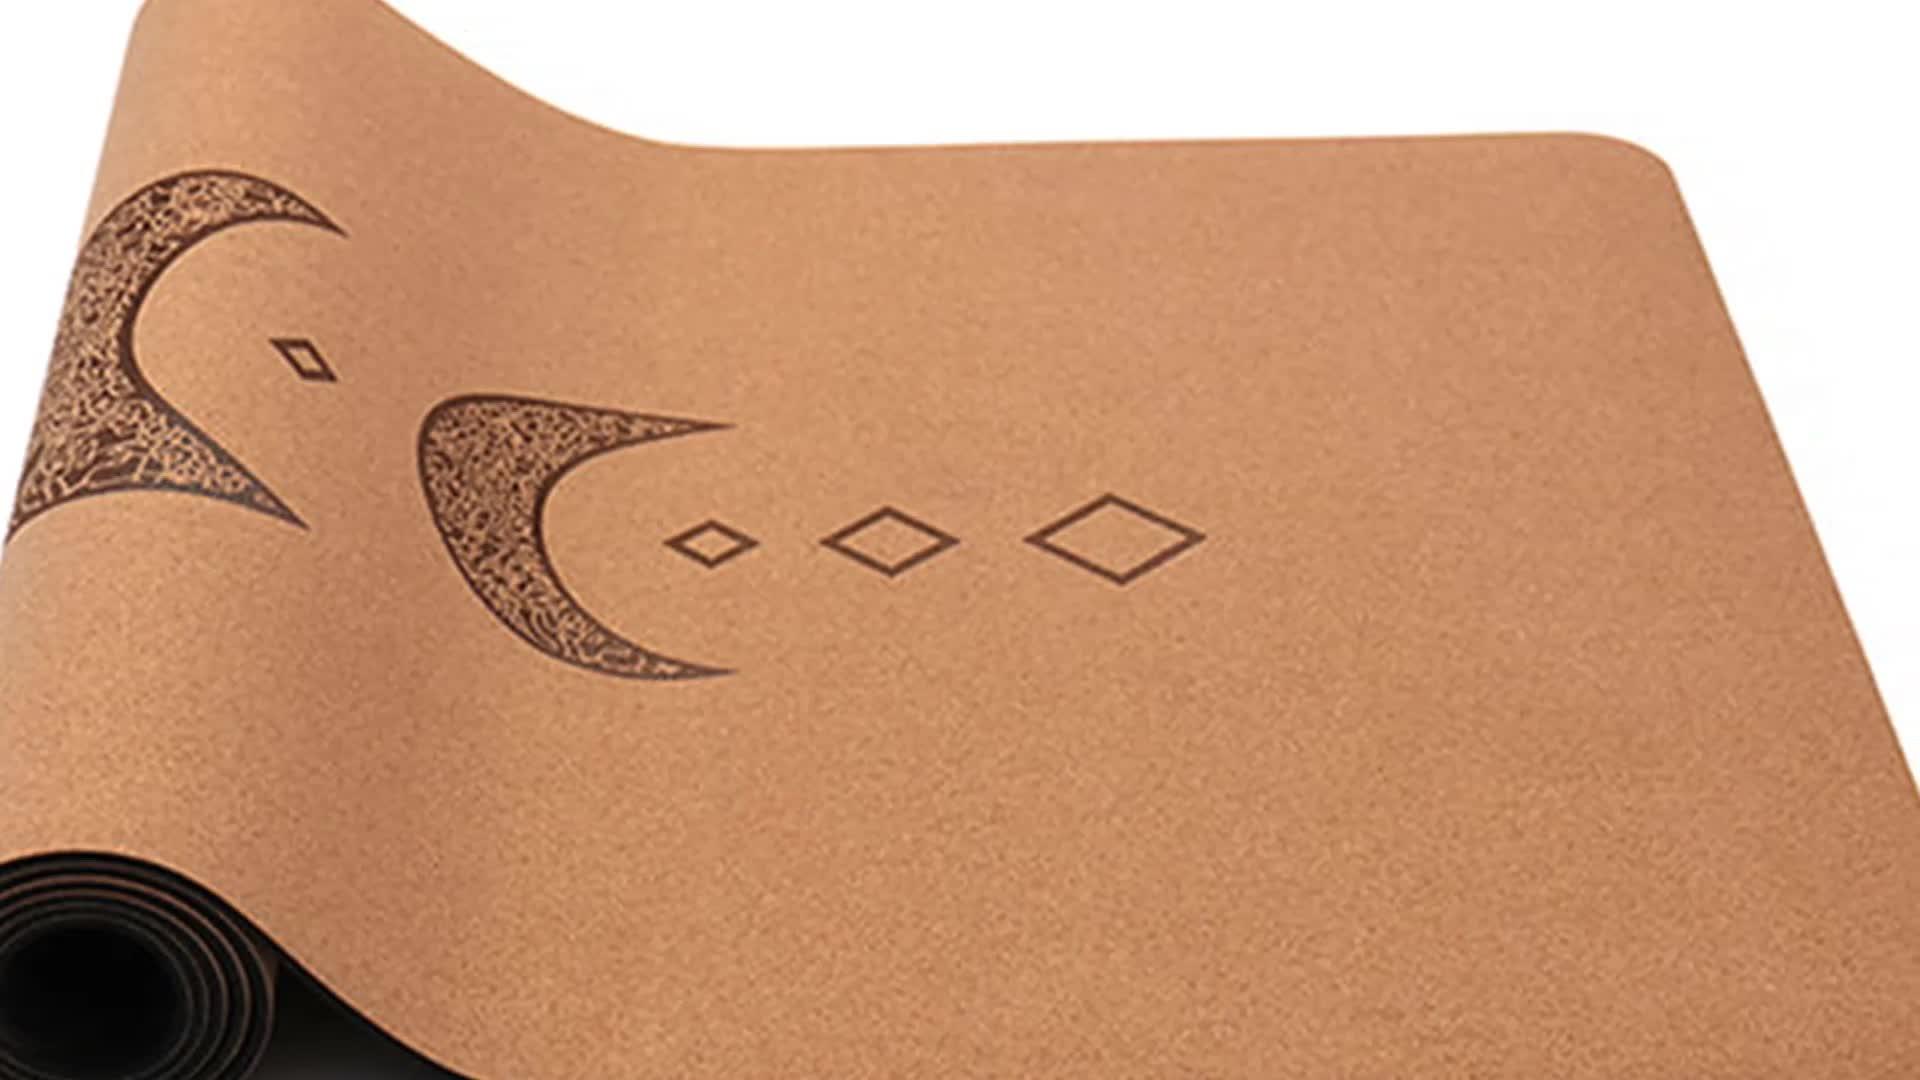 Fashion Wholesale Gym High Quality Yoga Mat Slip Non-Polluting